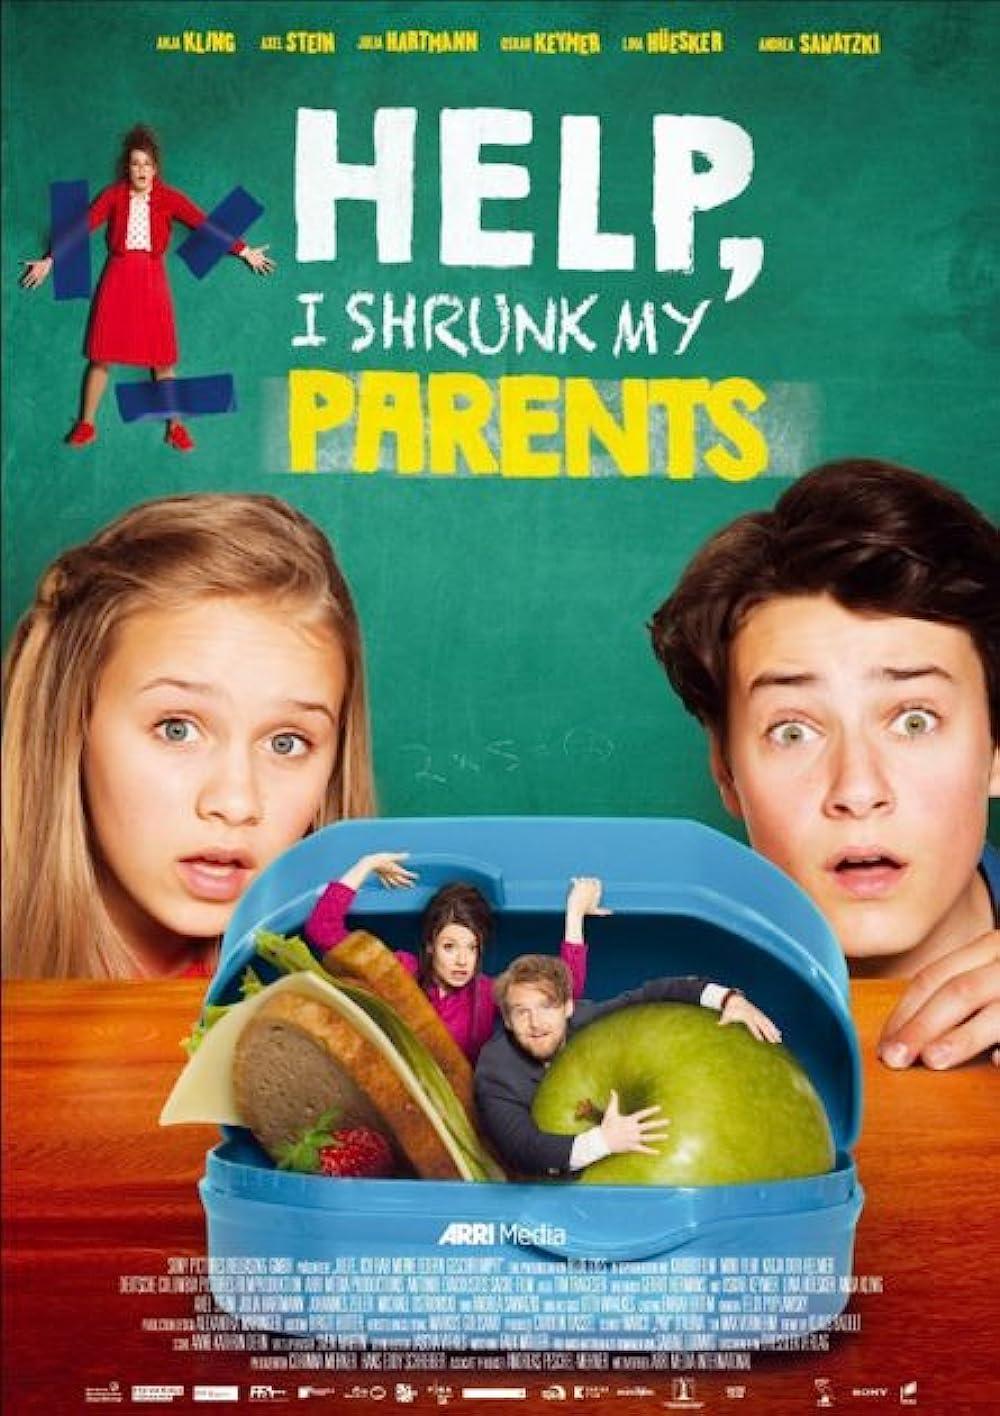 Help, I Shrunk My Parents 2018 Hindi ORG Dual Audio 720p BluRay ESub 1GB x264 AAC